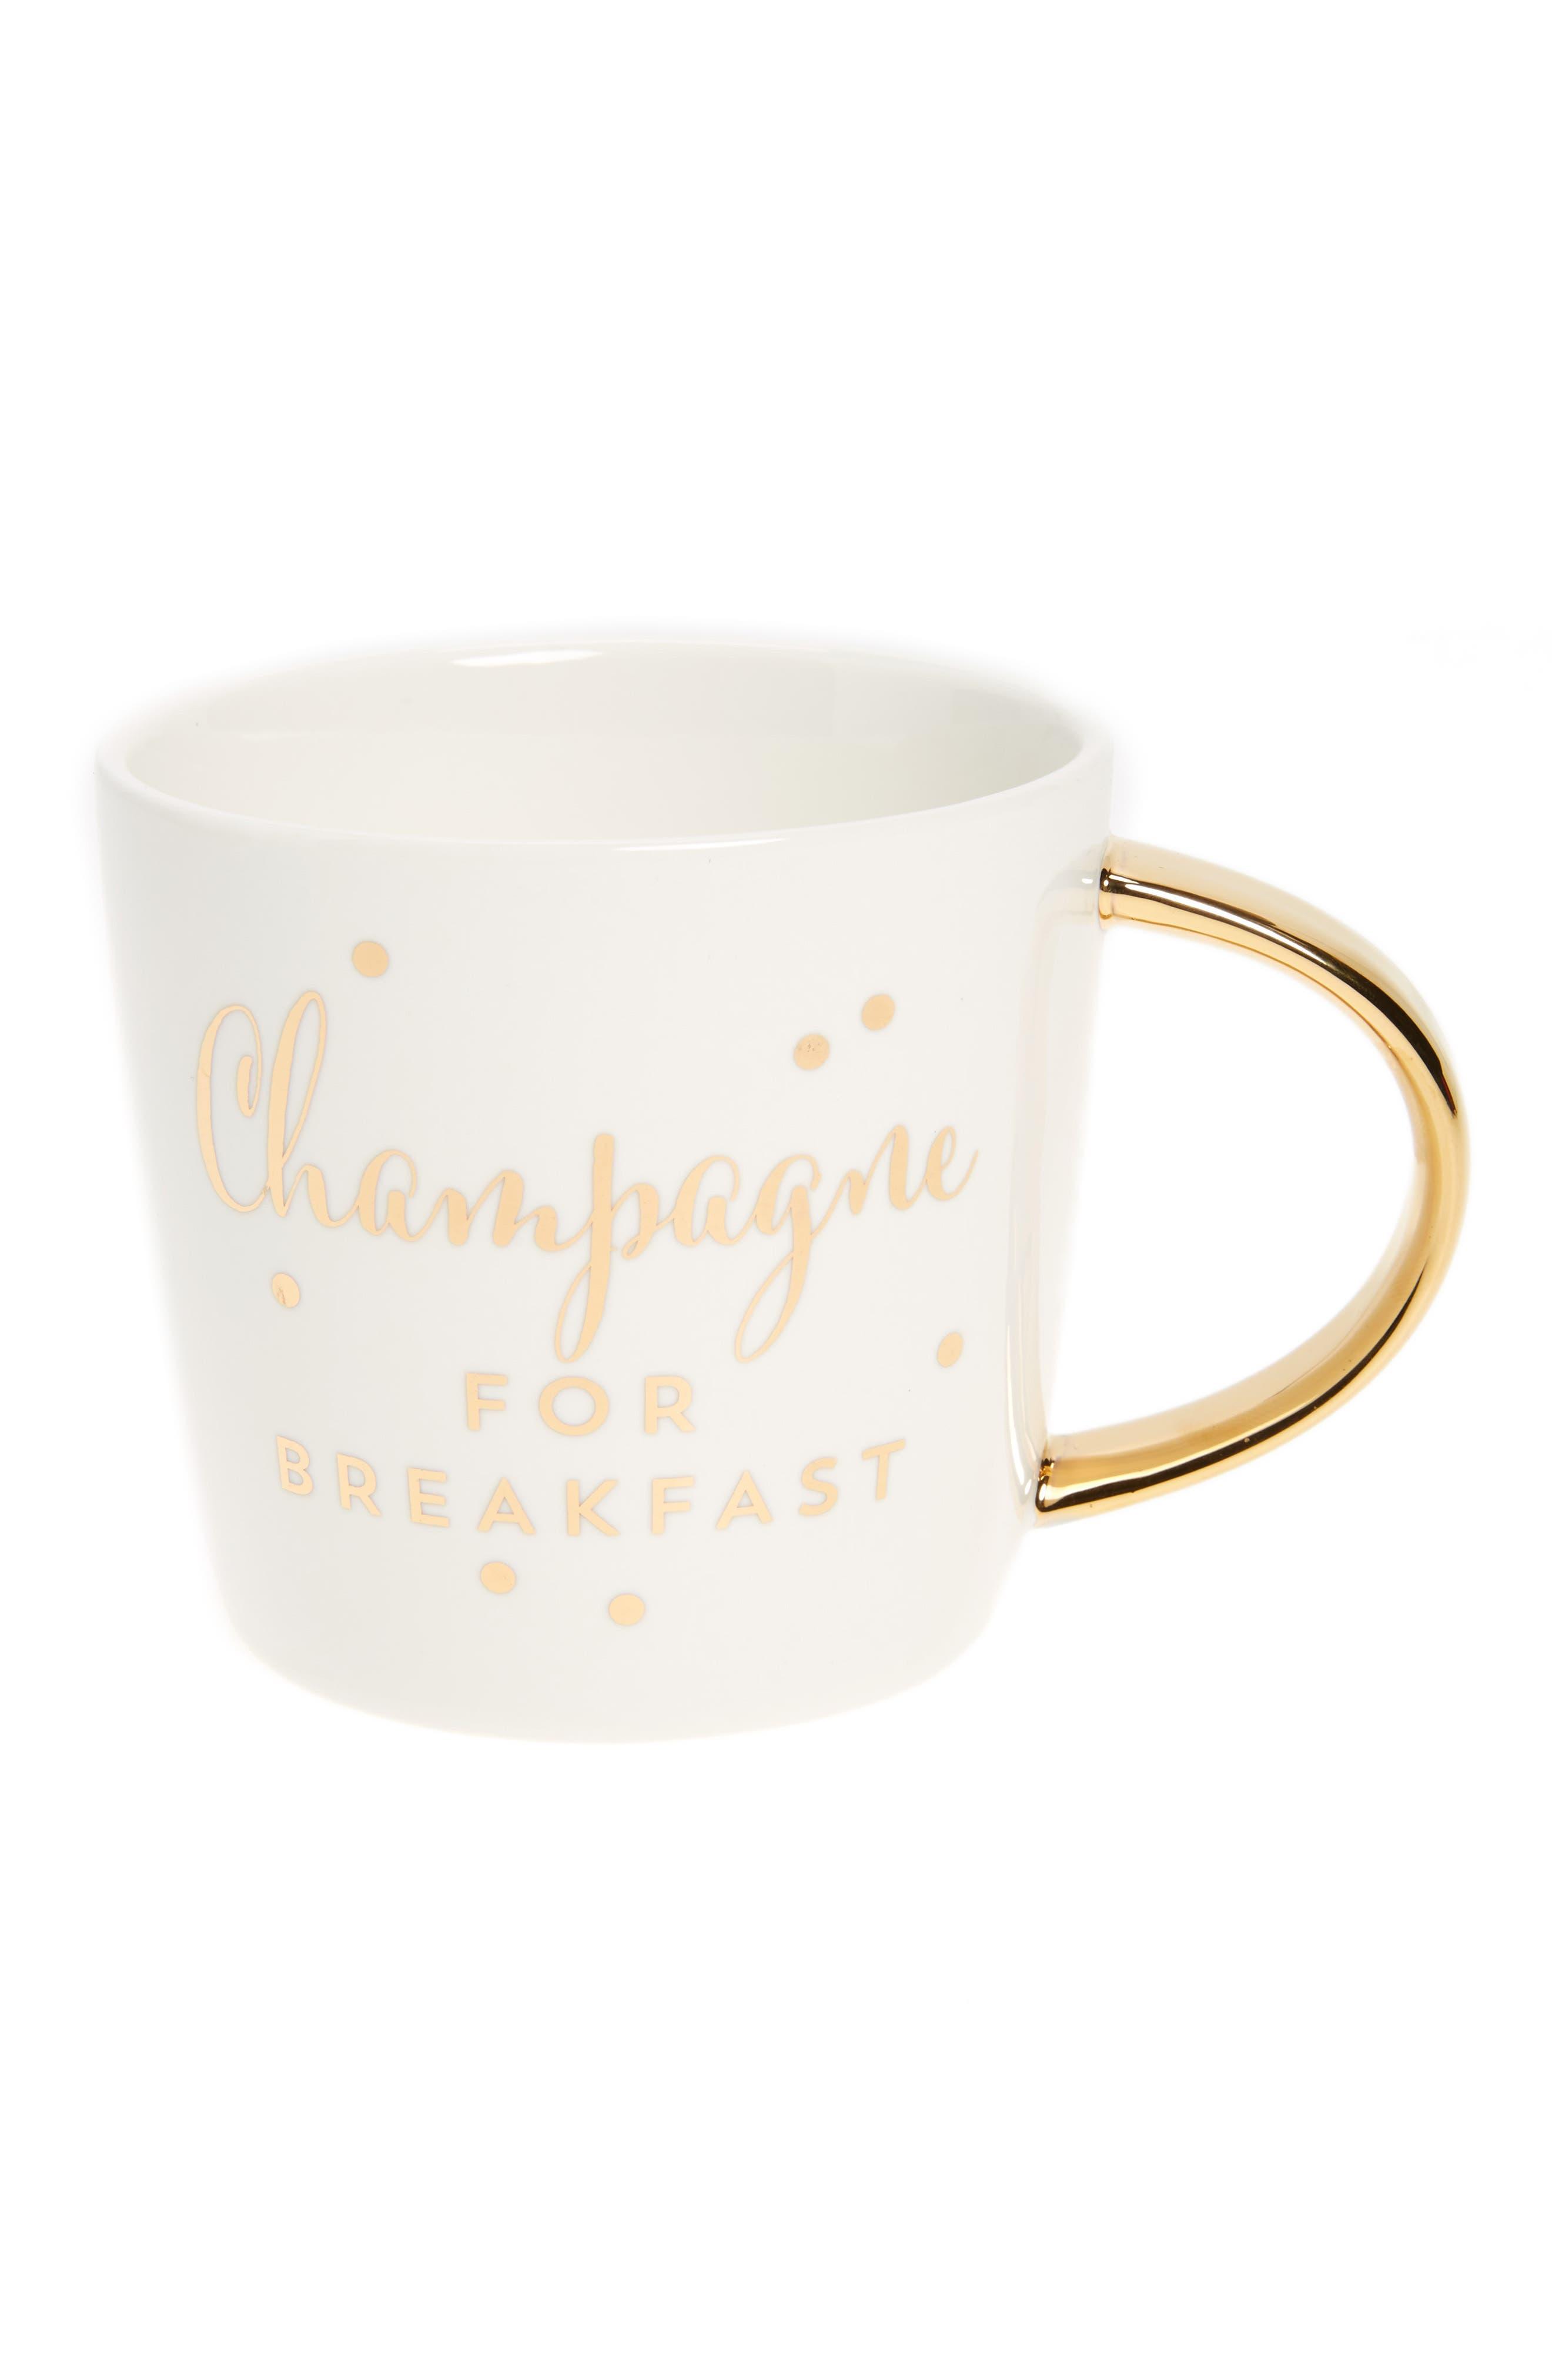 Alternate Image 1 Selected - Slant Collections Champagne For Breakfast Mug